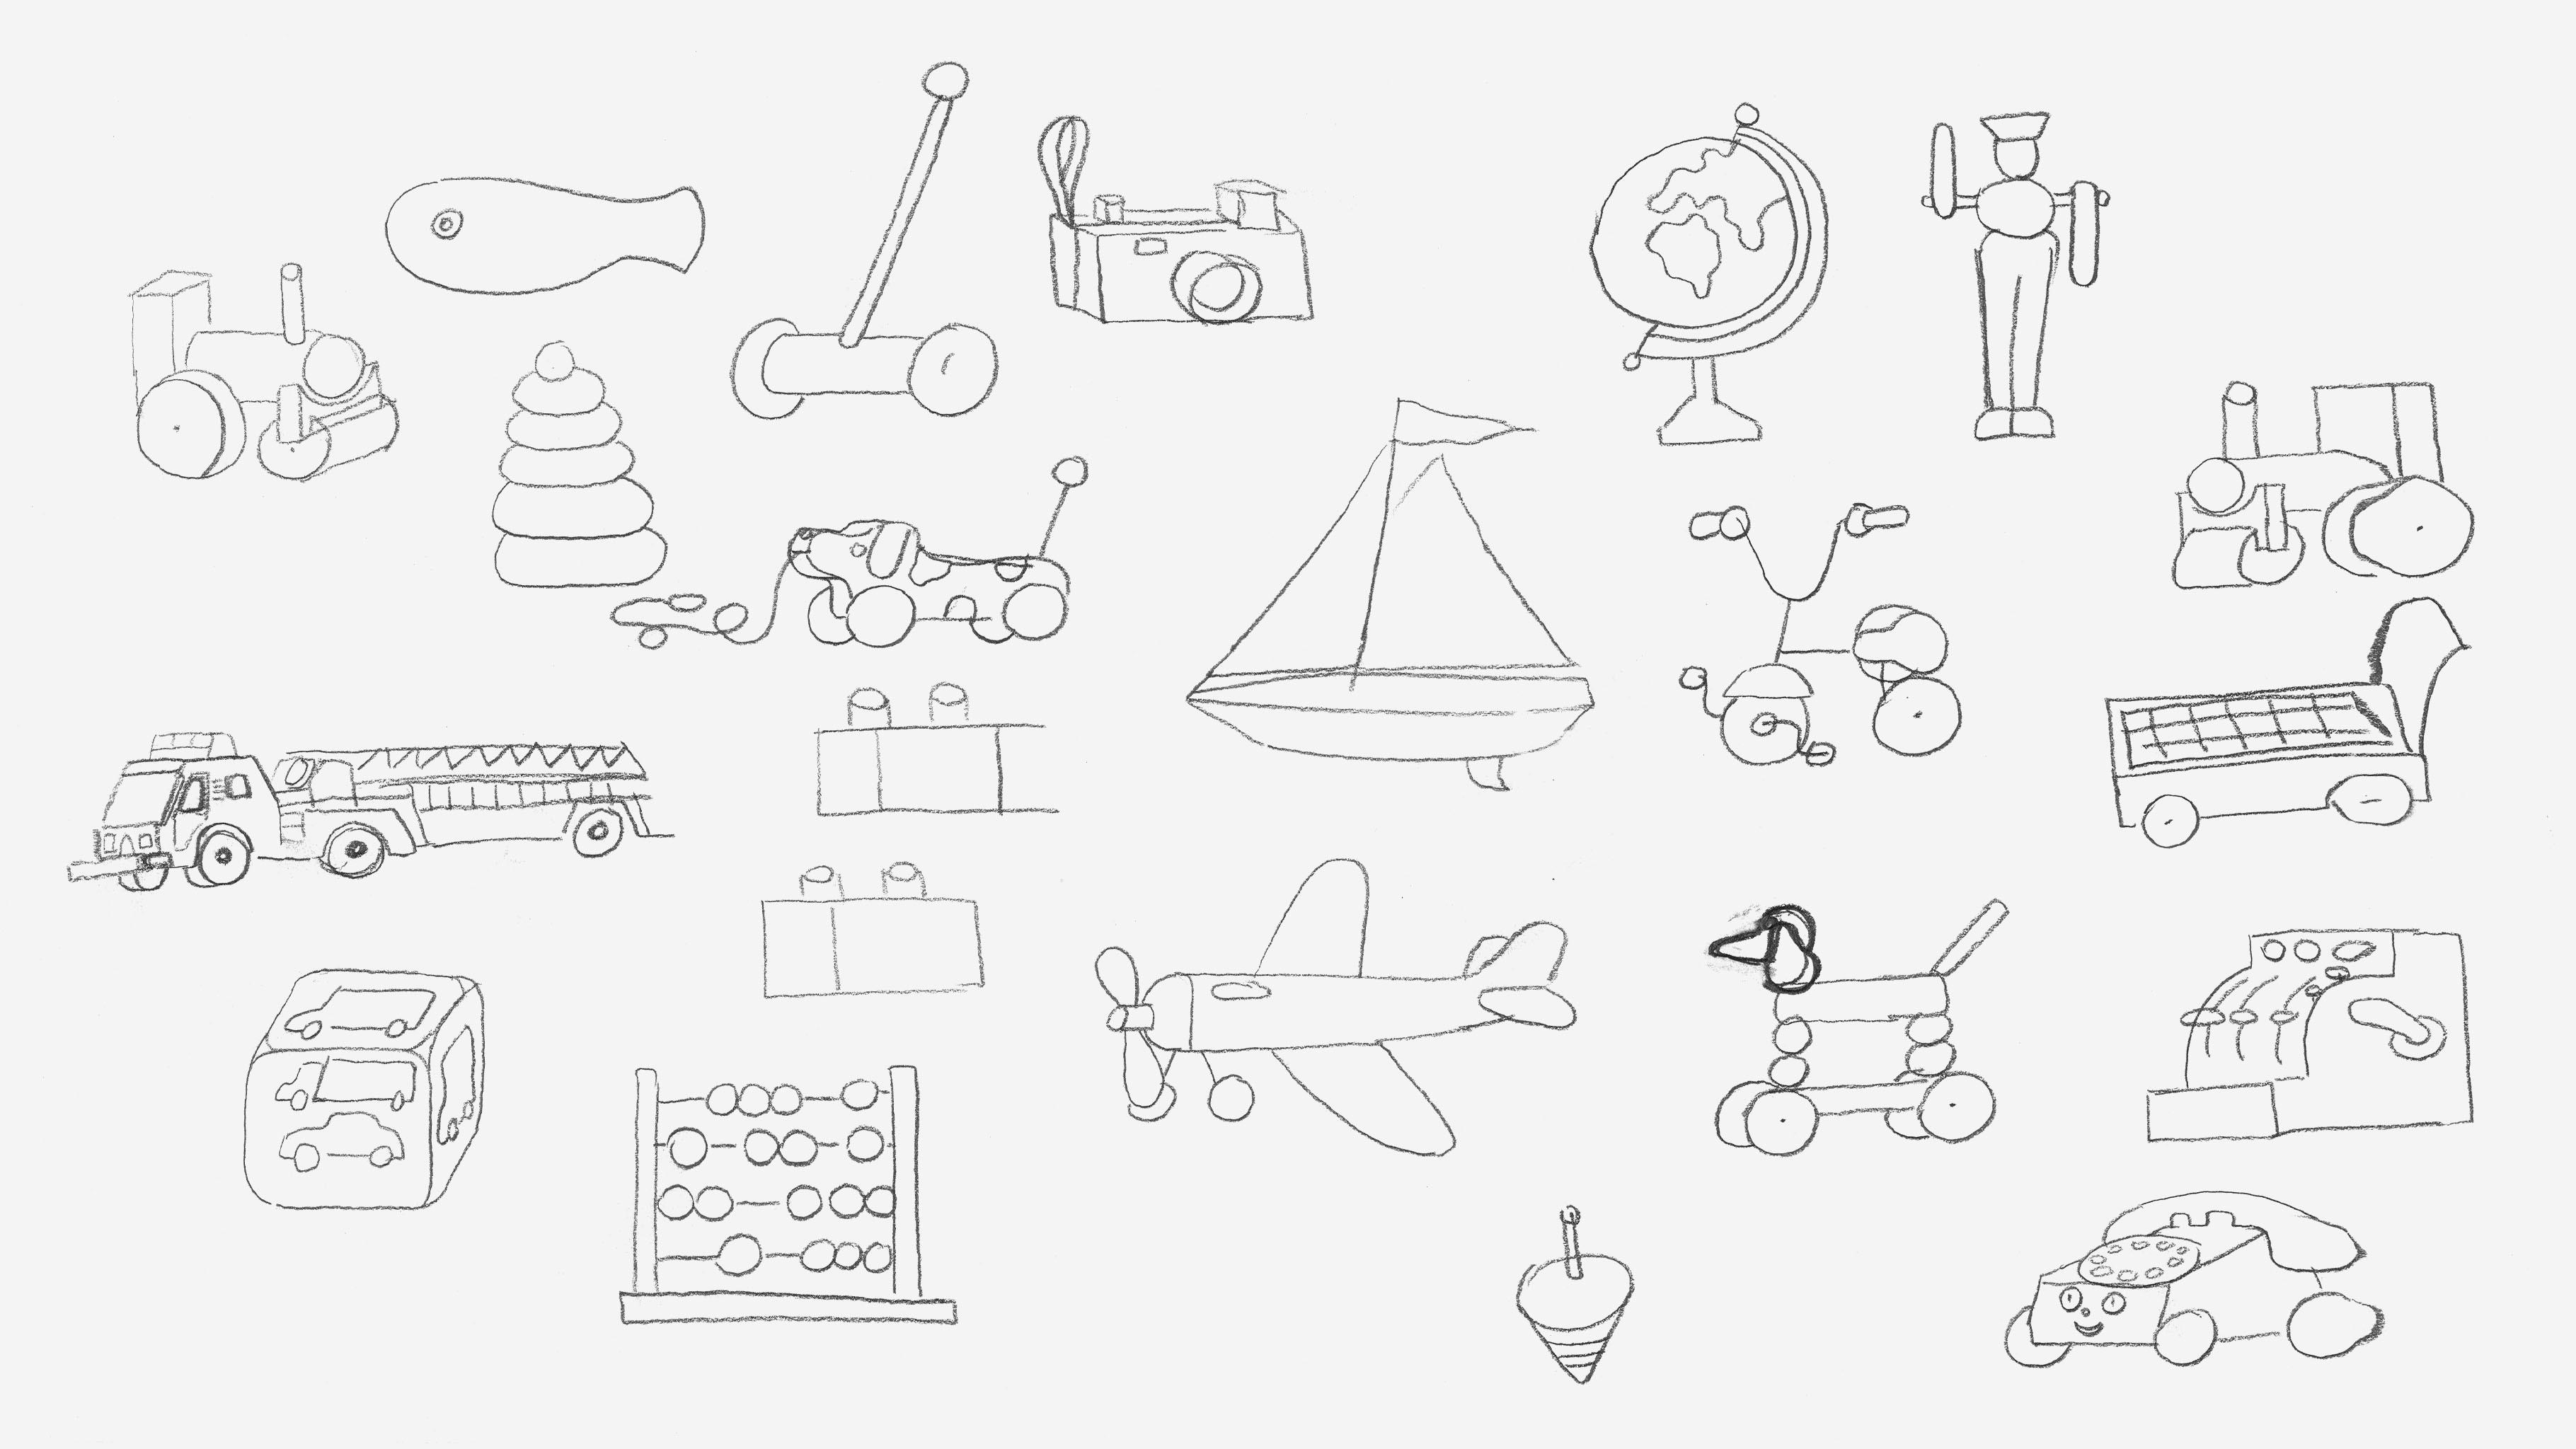 Facebook Groups James Graham Sketches Storyboards 03